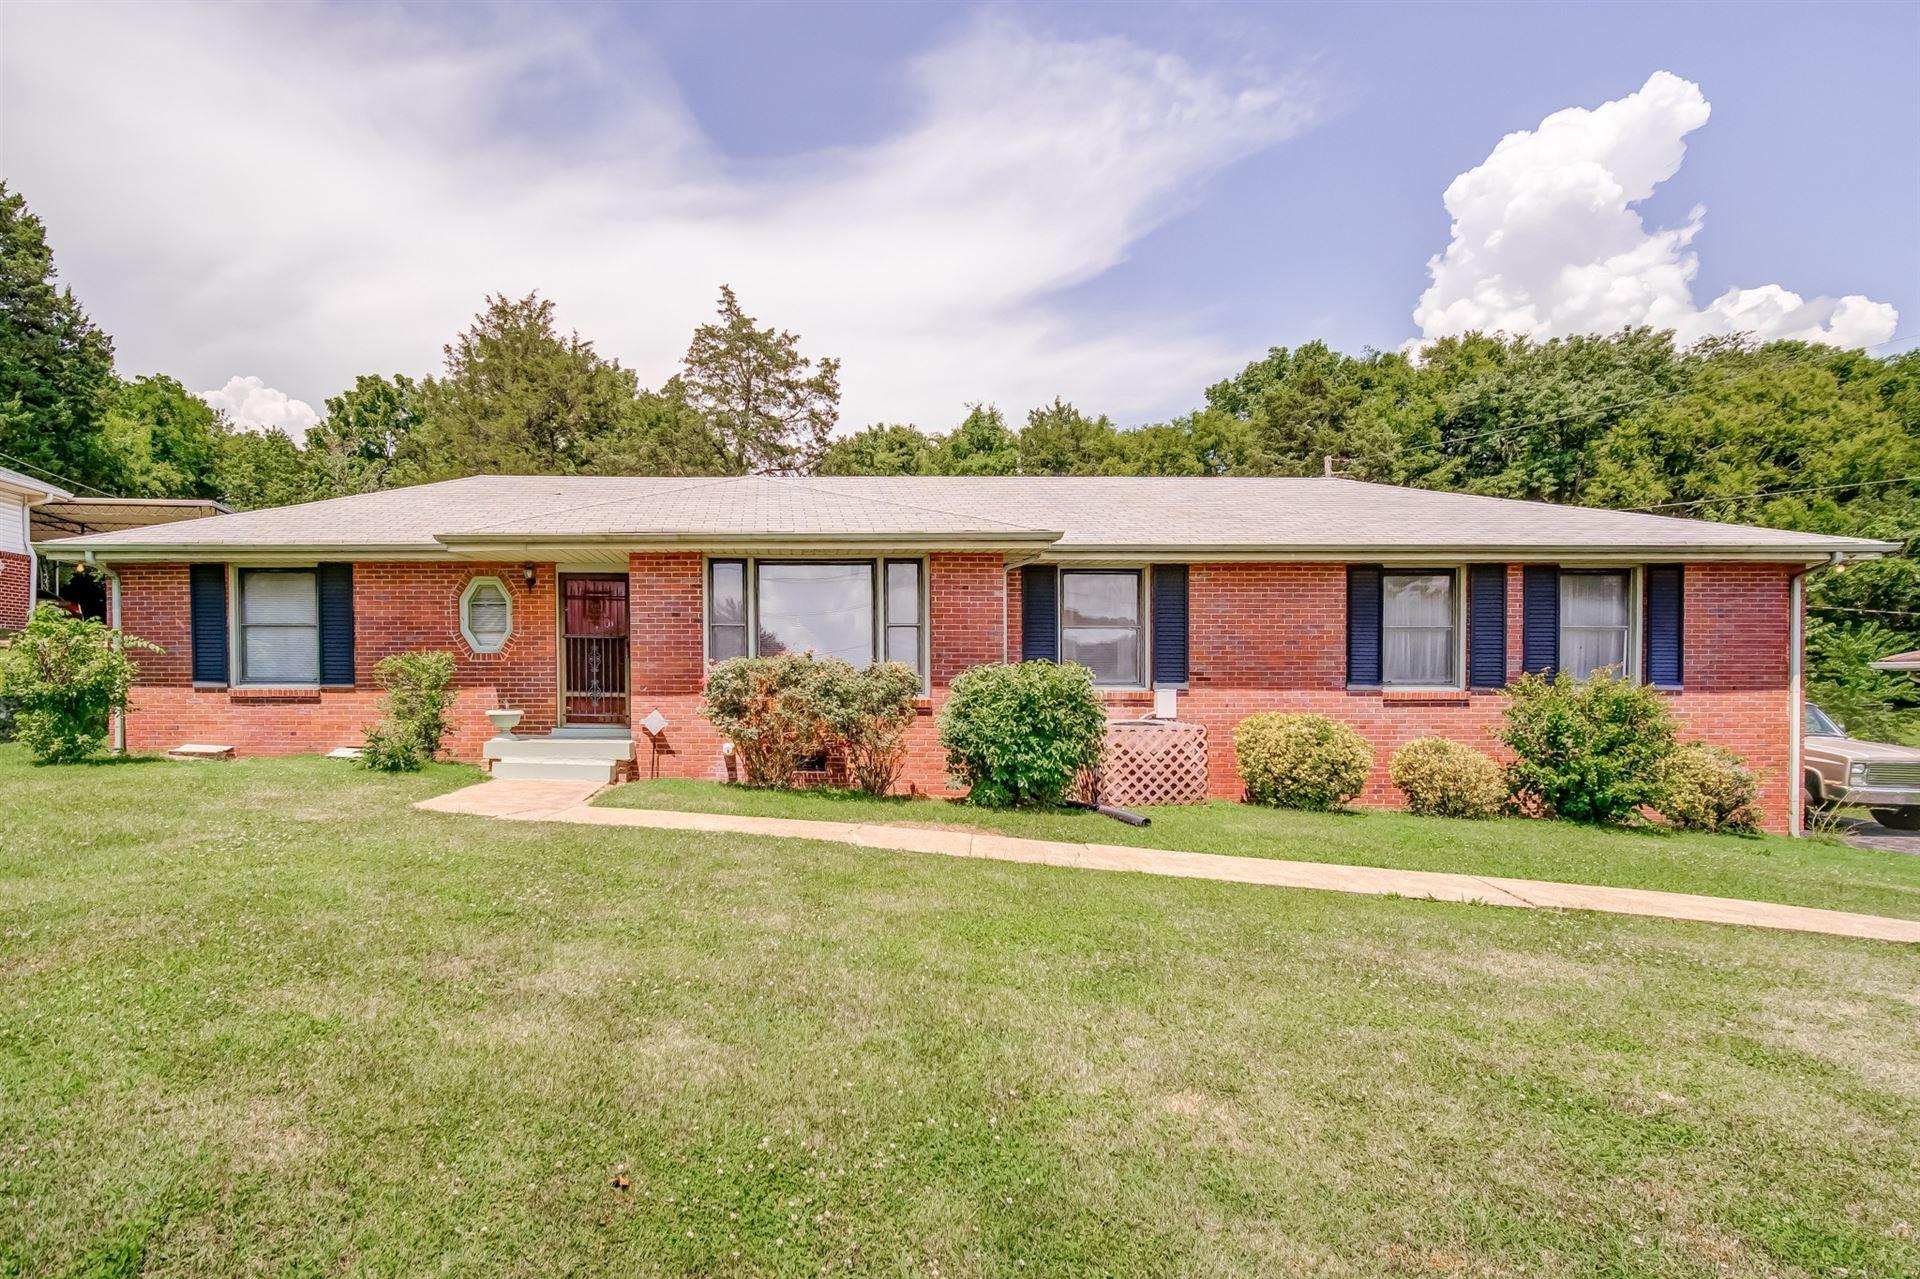 822 W Old Hickory Blvd, Madison, TN 37115 - MLS#: 2168151